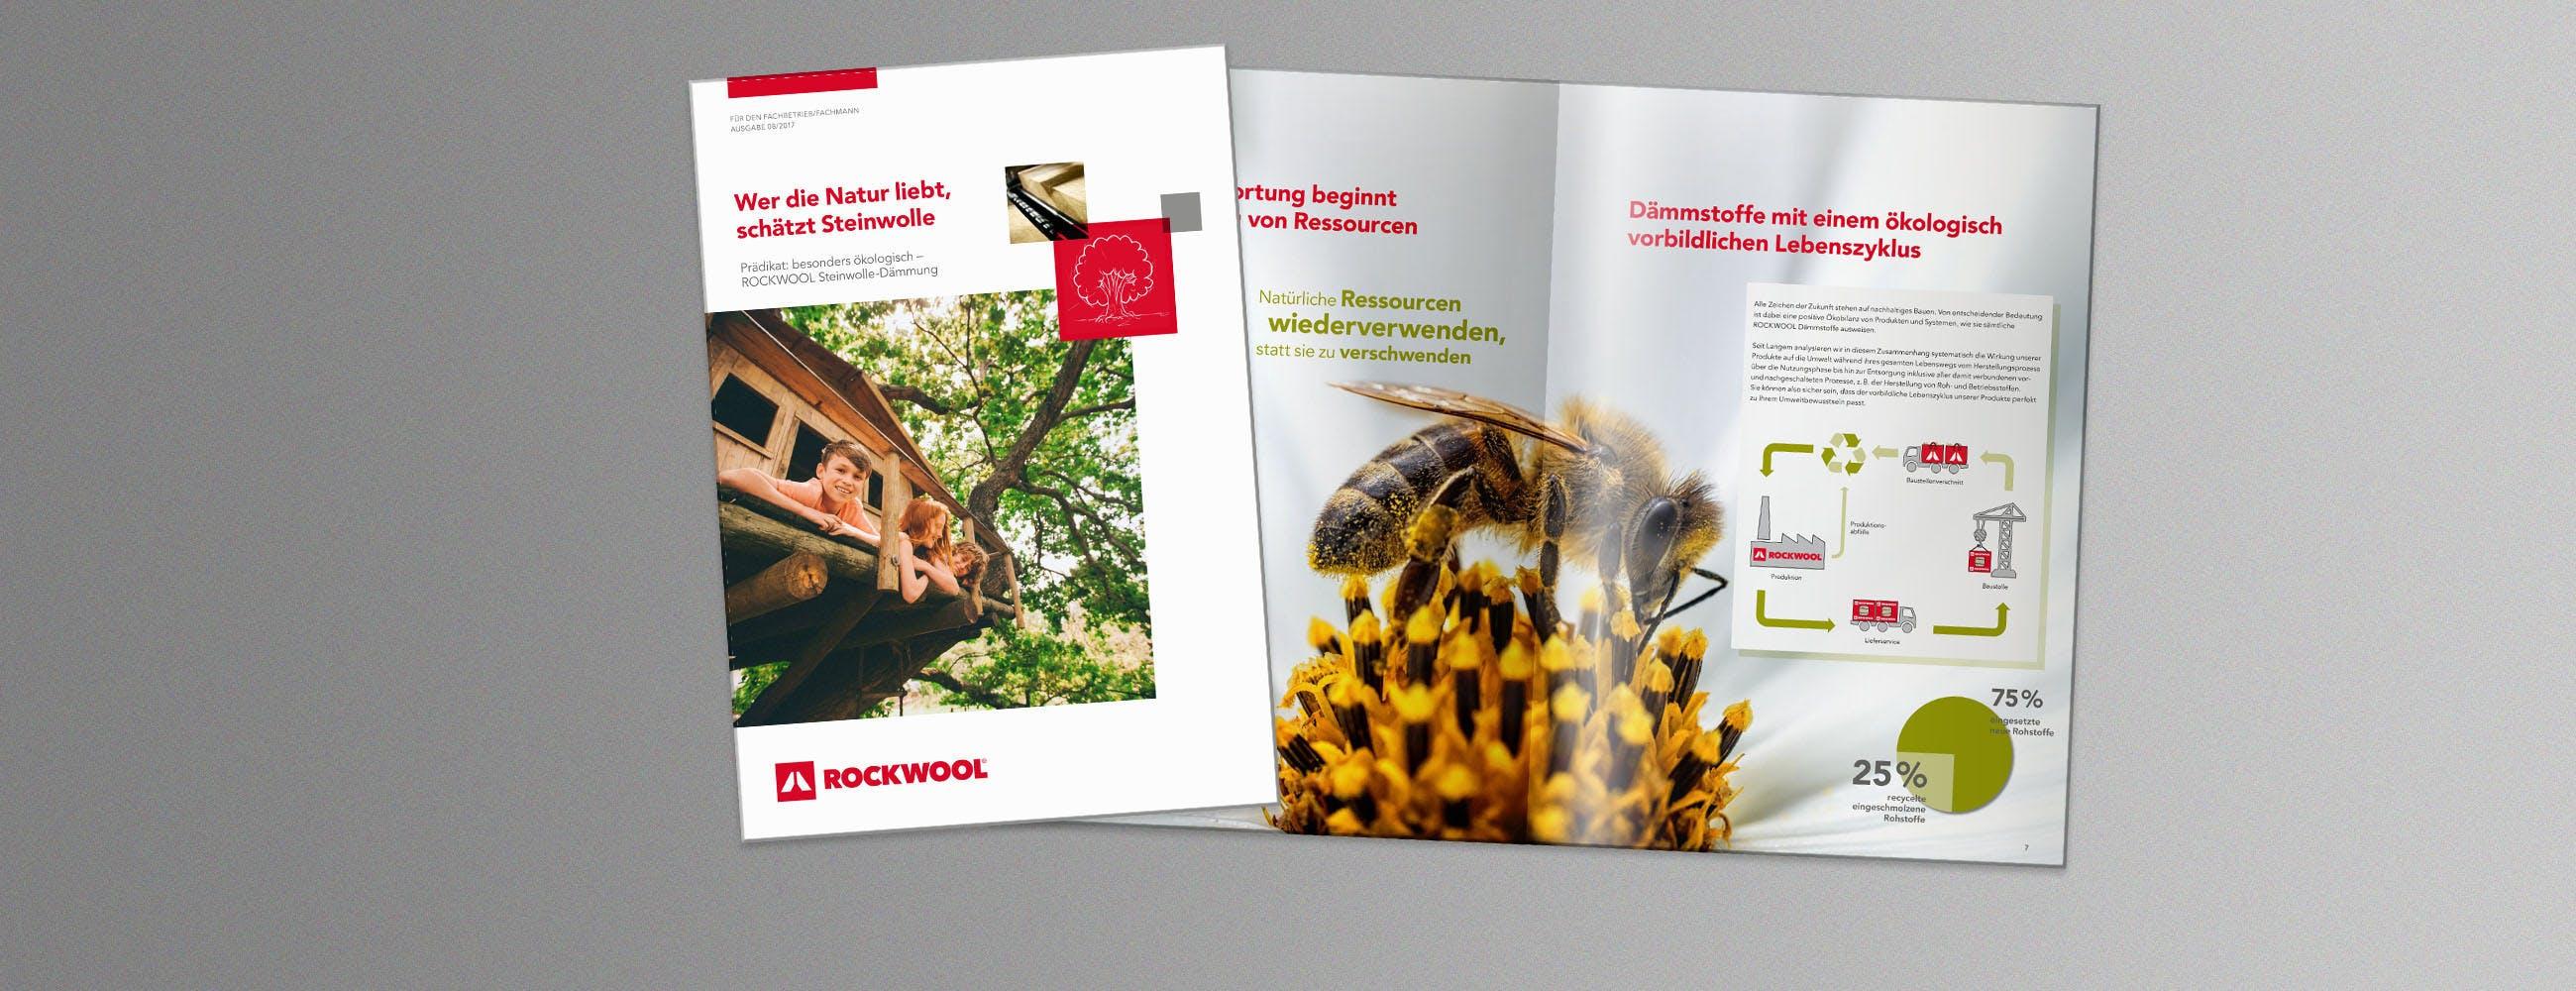 thumb, thumbnail, brochure, brochures, downloads, sustainability, germany, photo, preview photo, Ökologie Broschüre